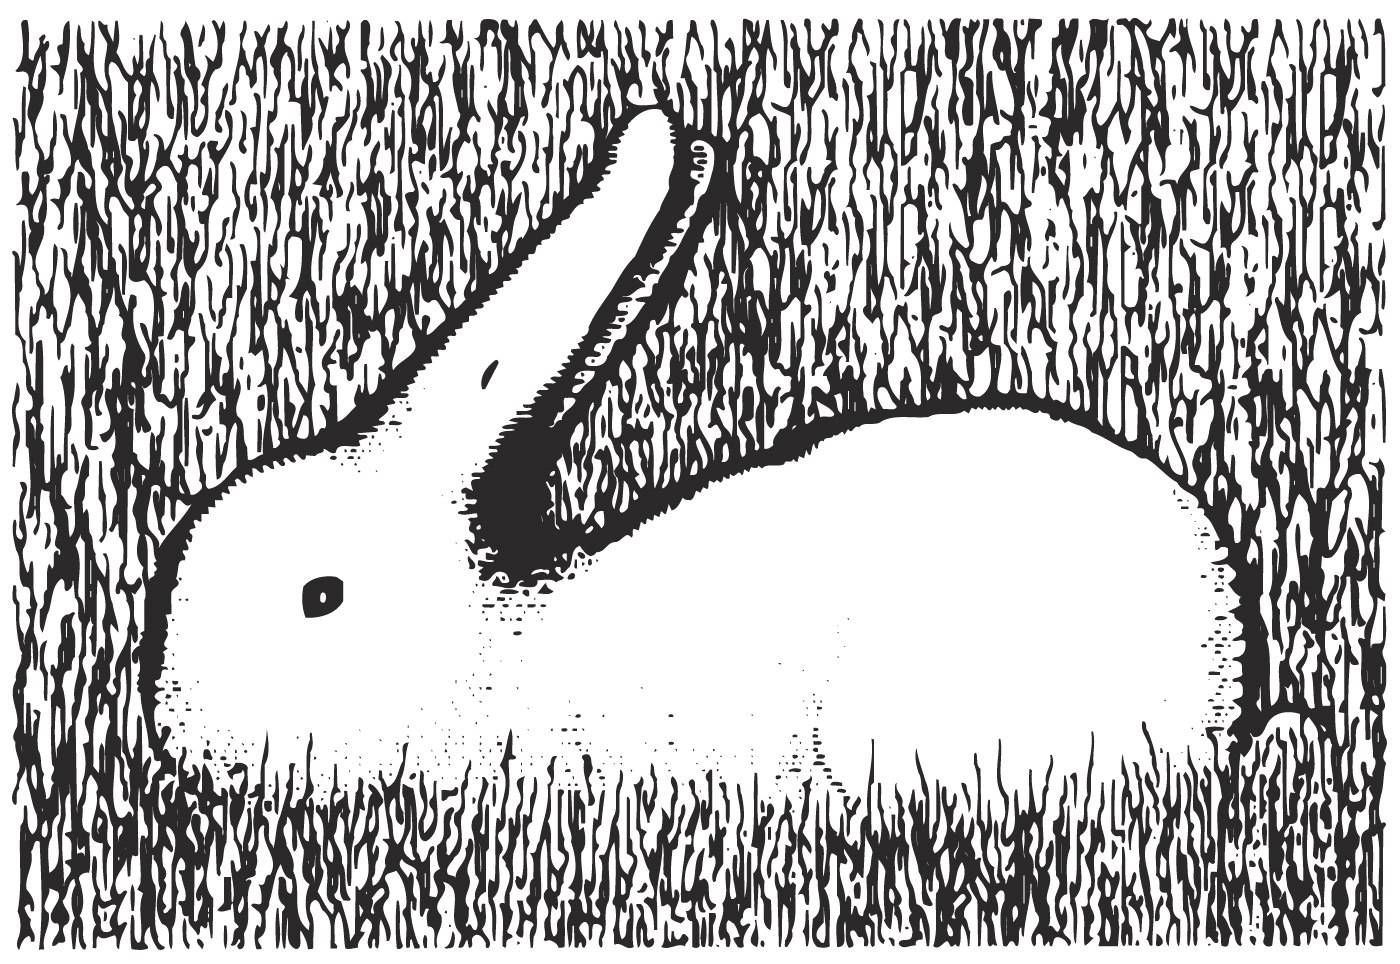 optical duck bunny illusion illusions rabbit sketch brain teasers cool خطای دید tricks mind eye hidden puzzles fun grass opticalillusion